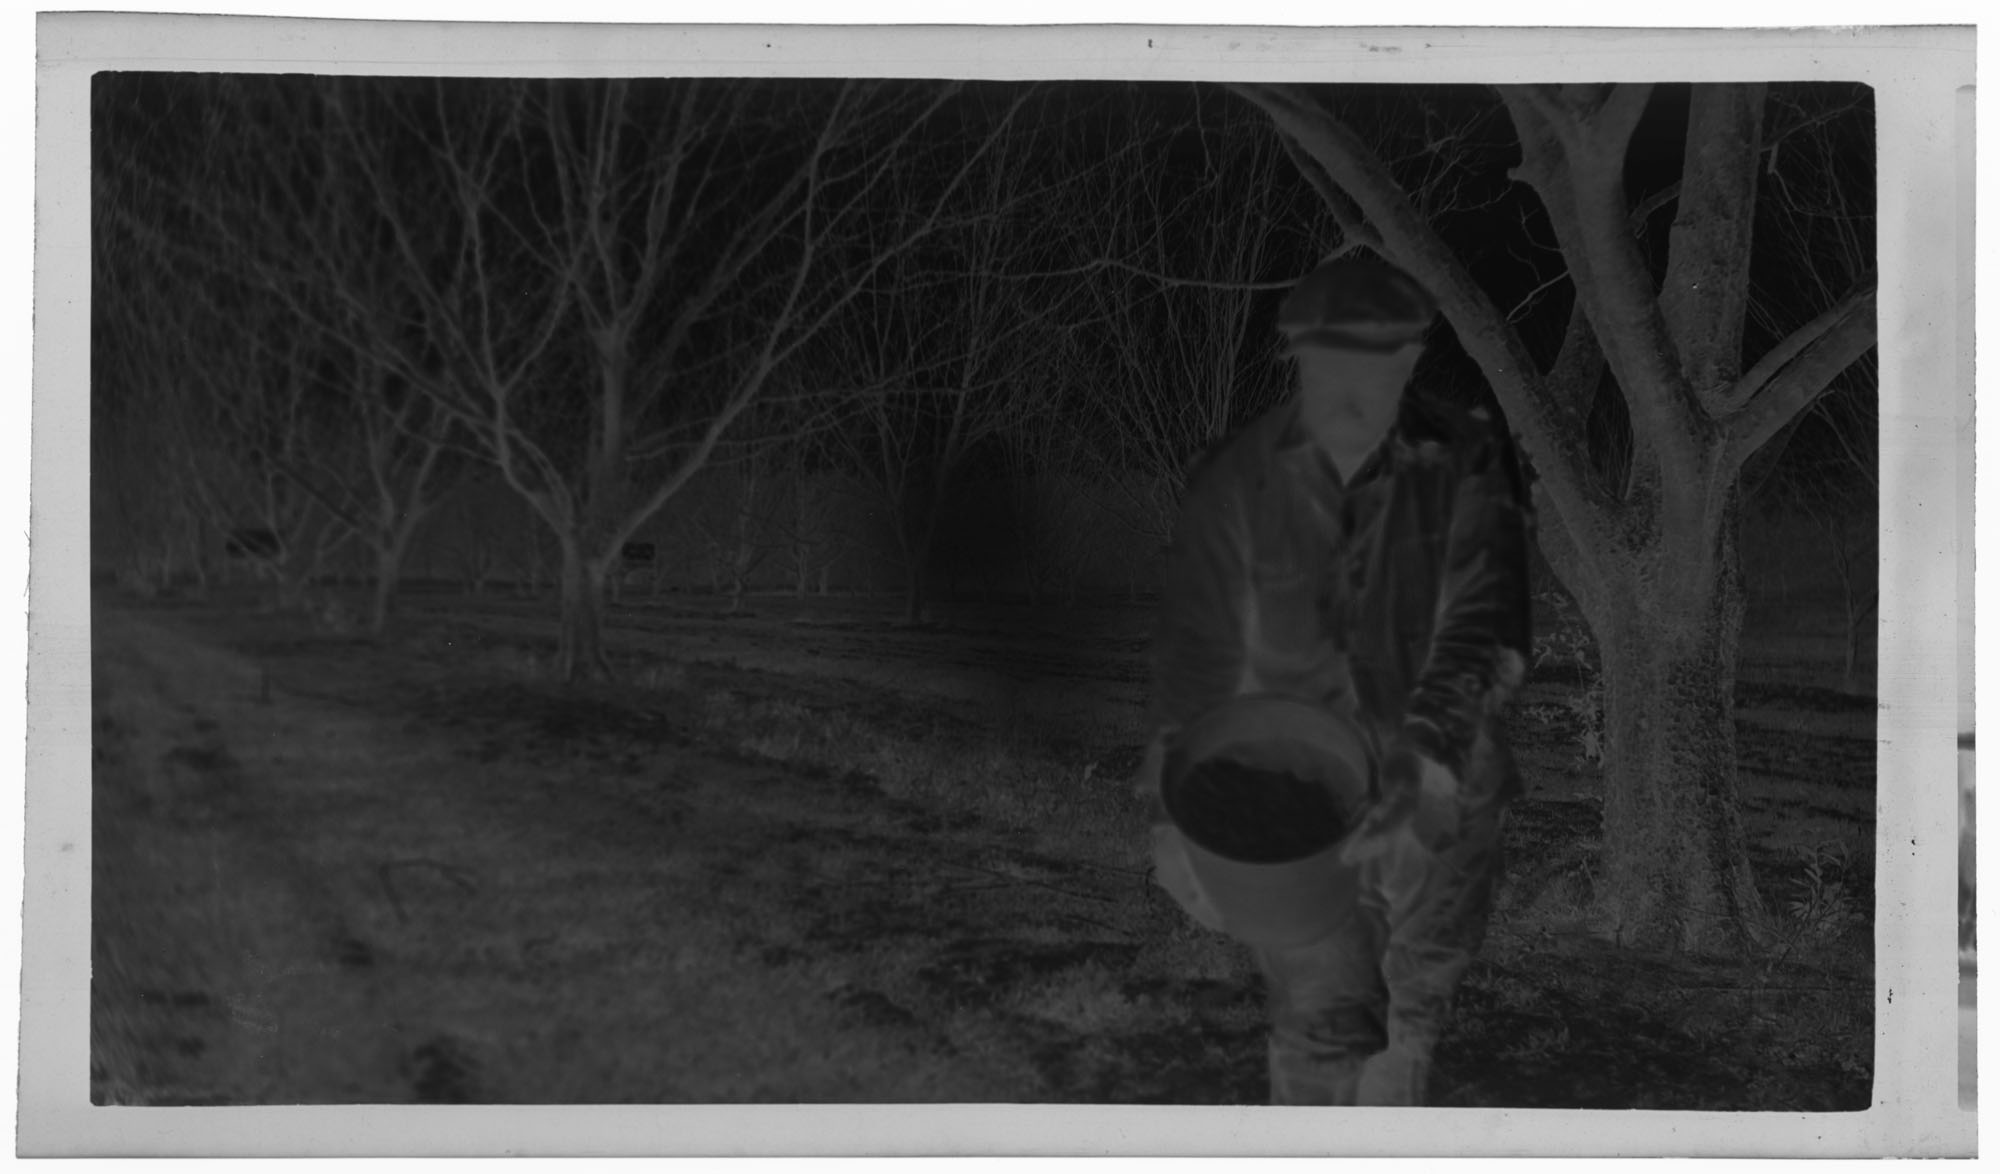 Negative of Man Fertilizing Pecans